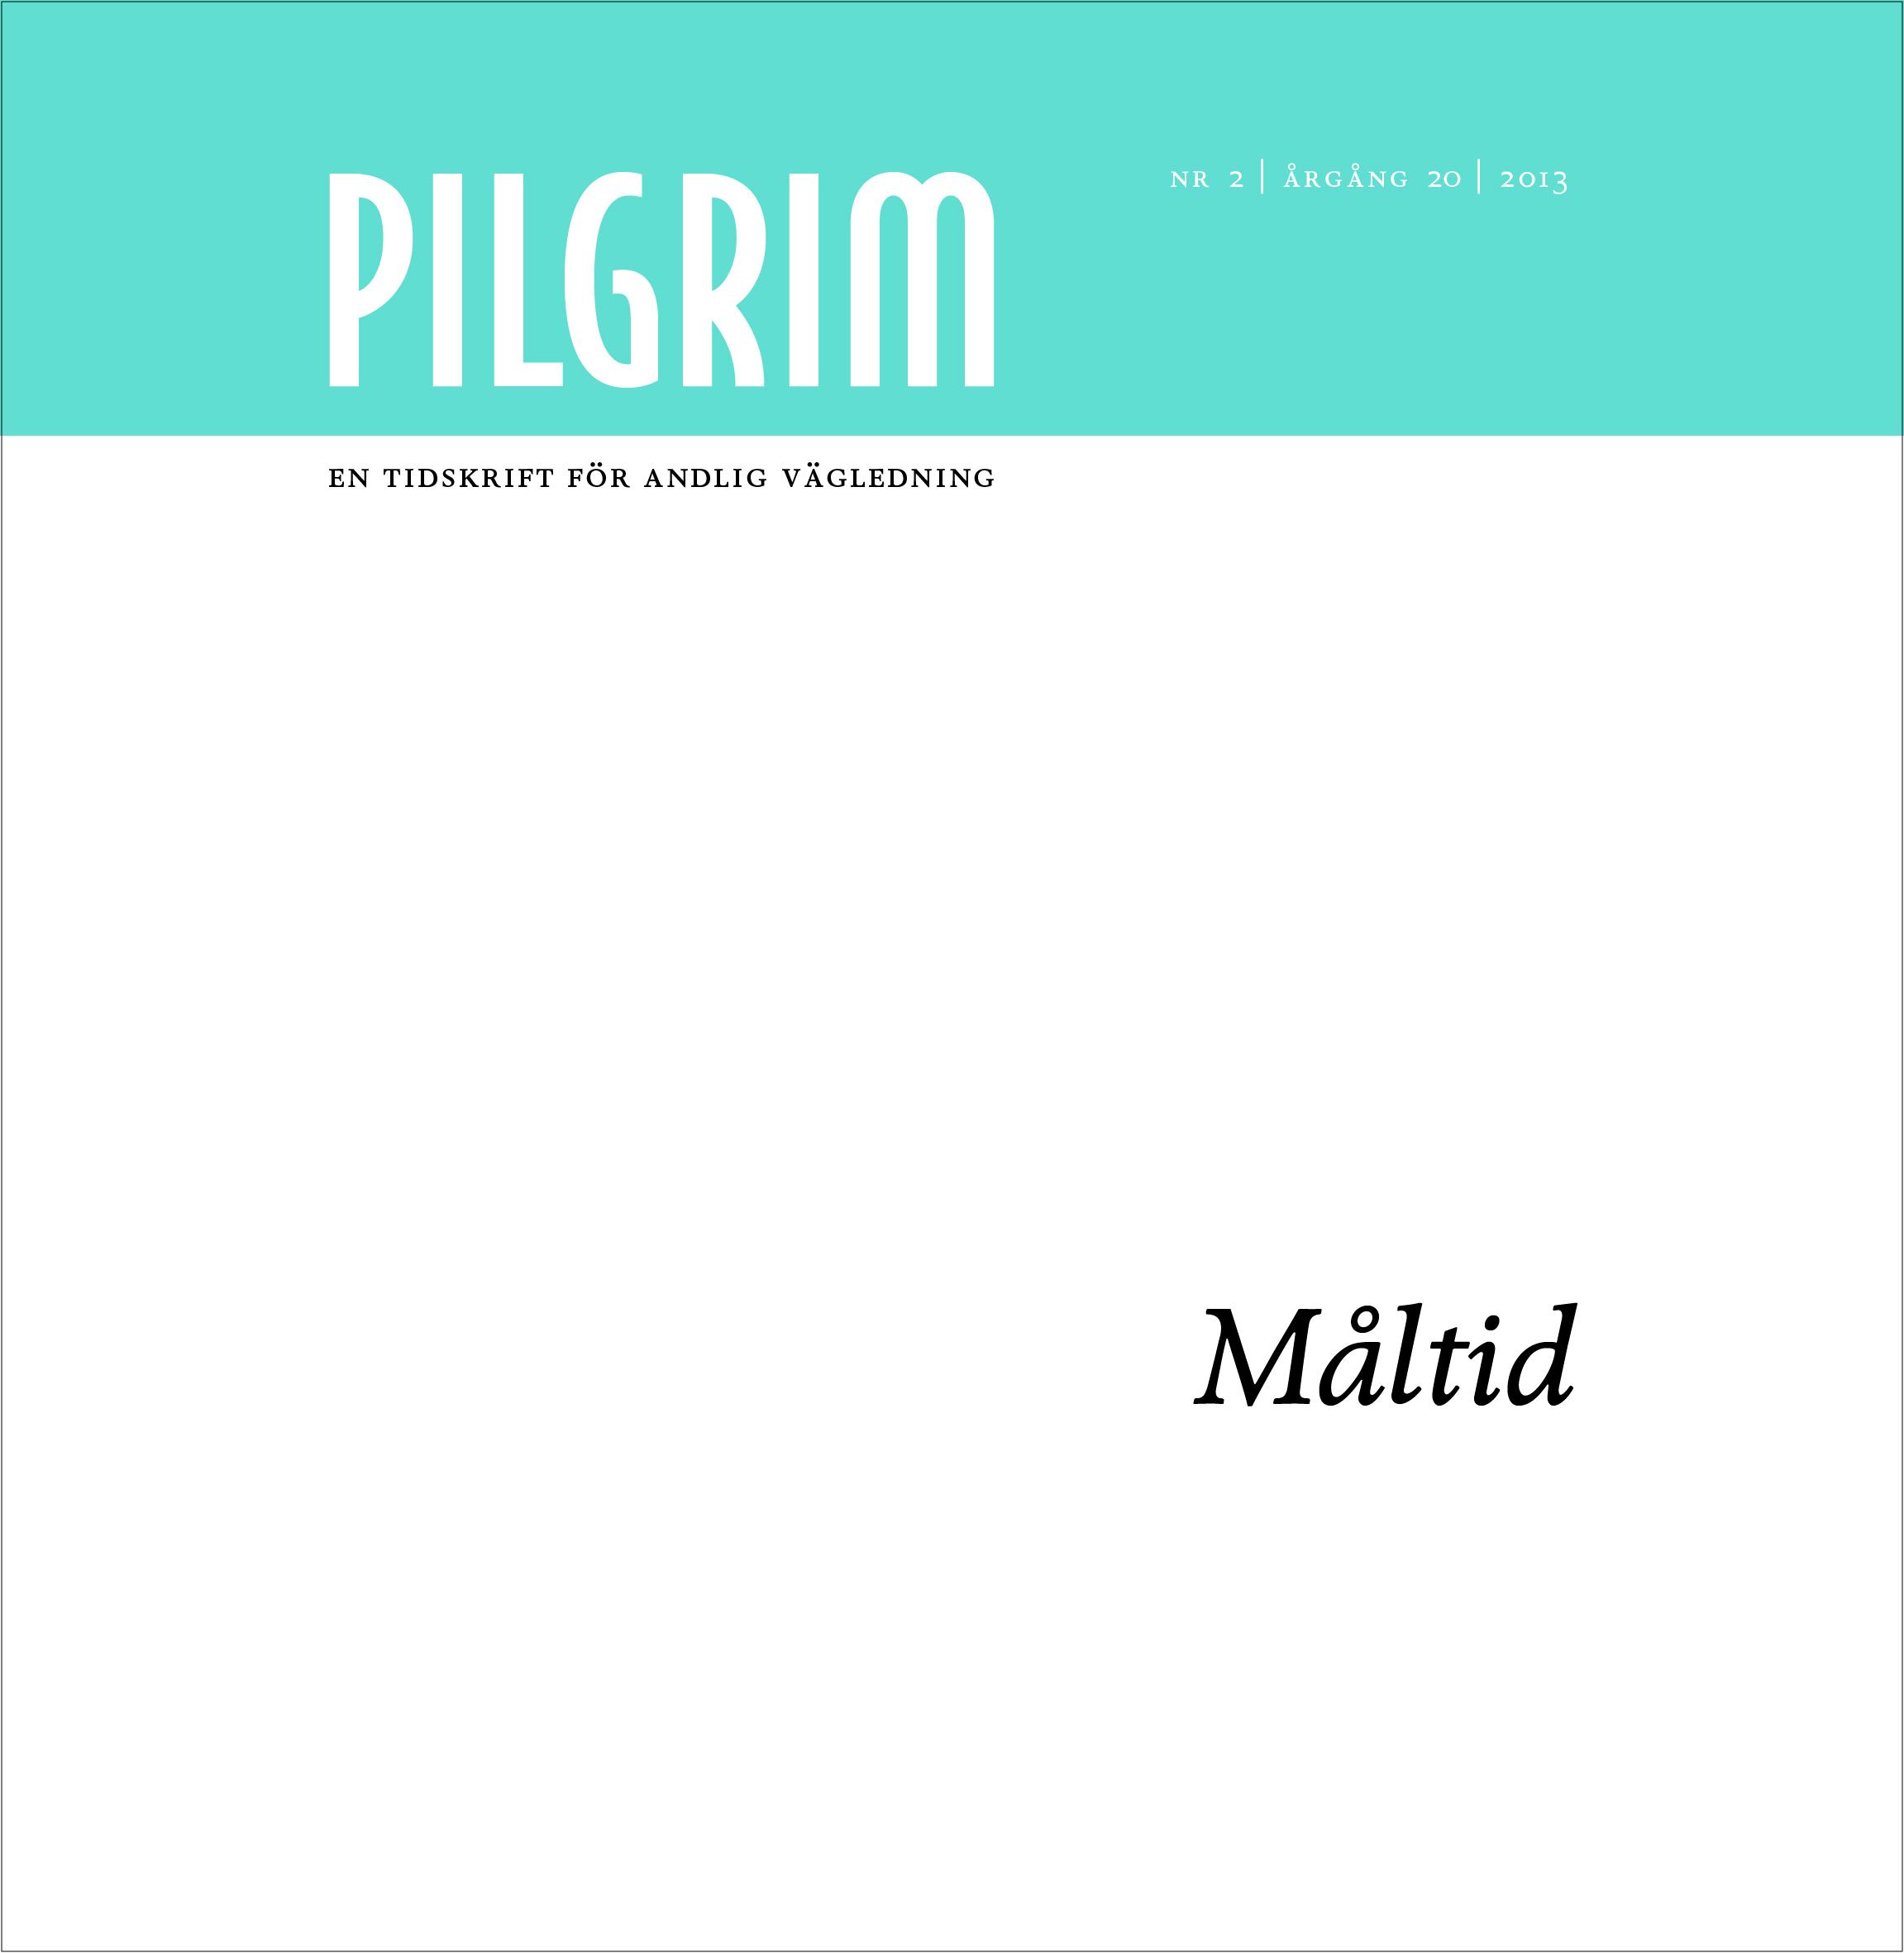 Pilgrim frams 2013-2